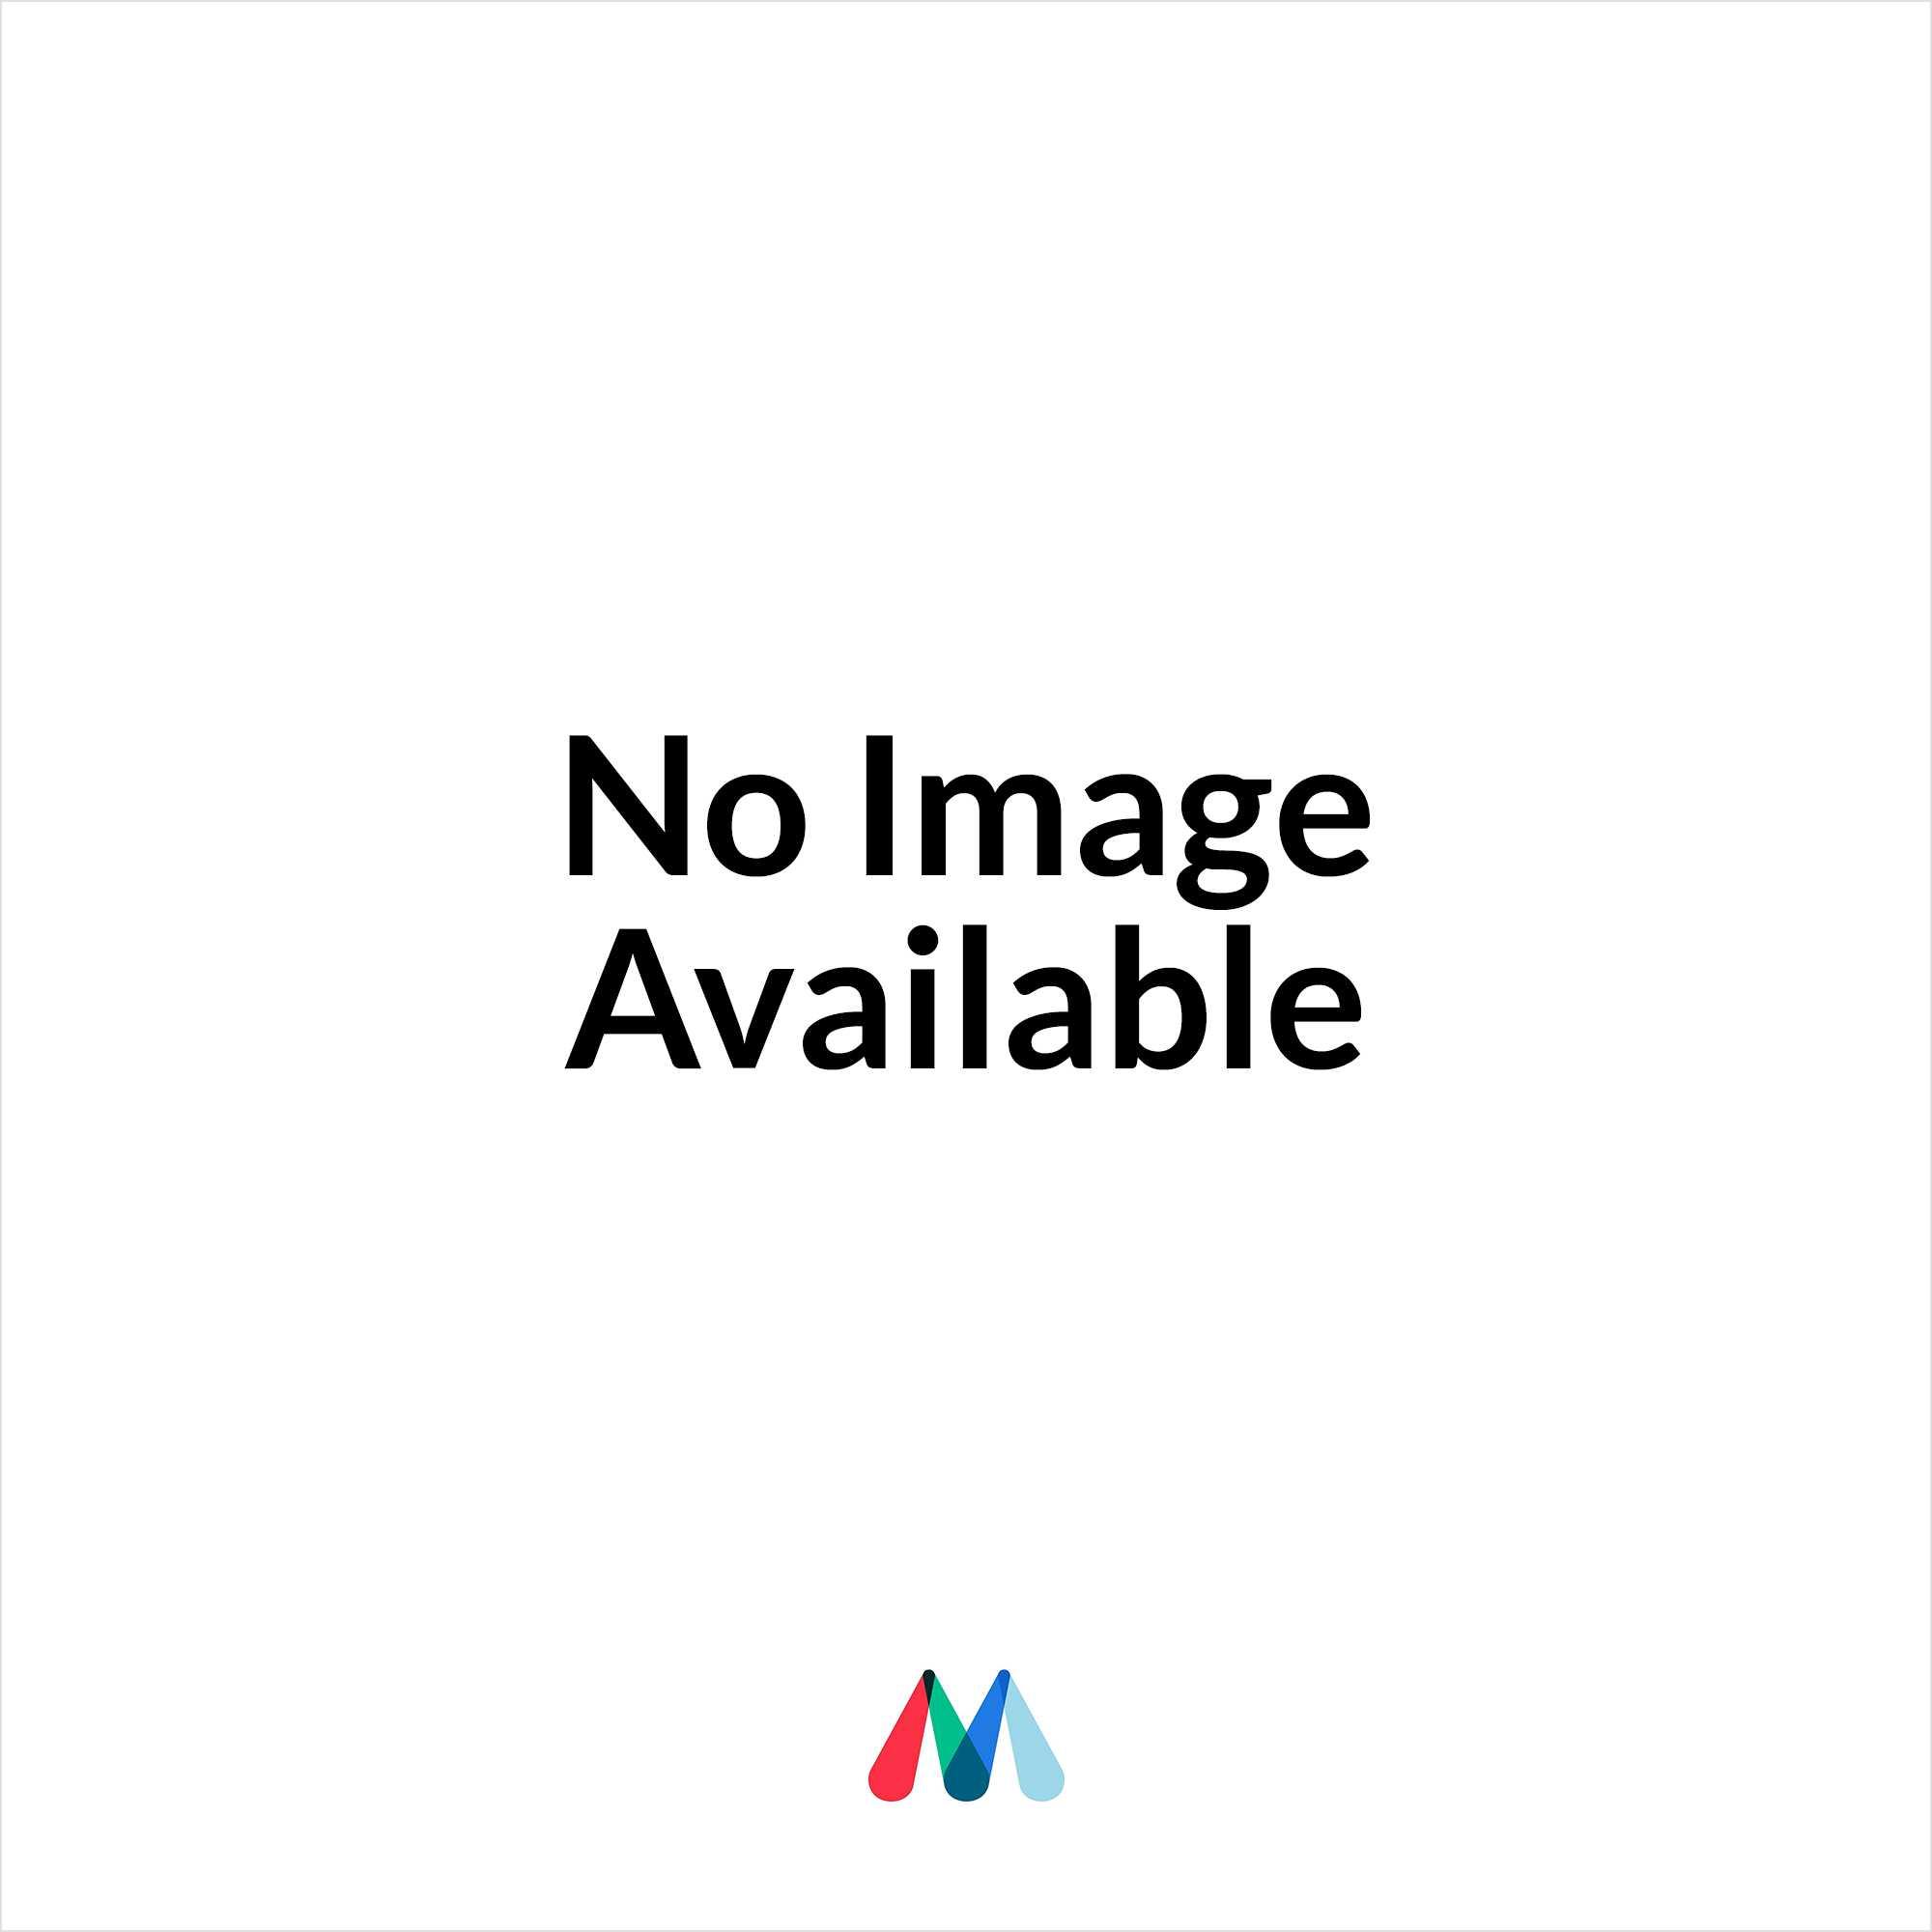 LL030CARGB Colour change LED unit (MR16 retro fit 23mm body) 3w - Aluminium